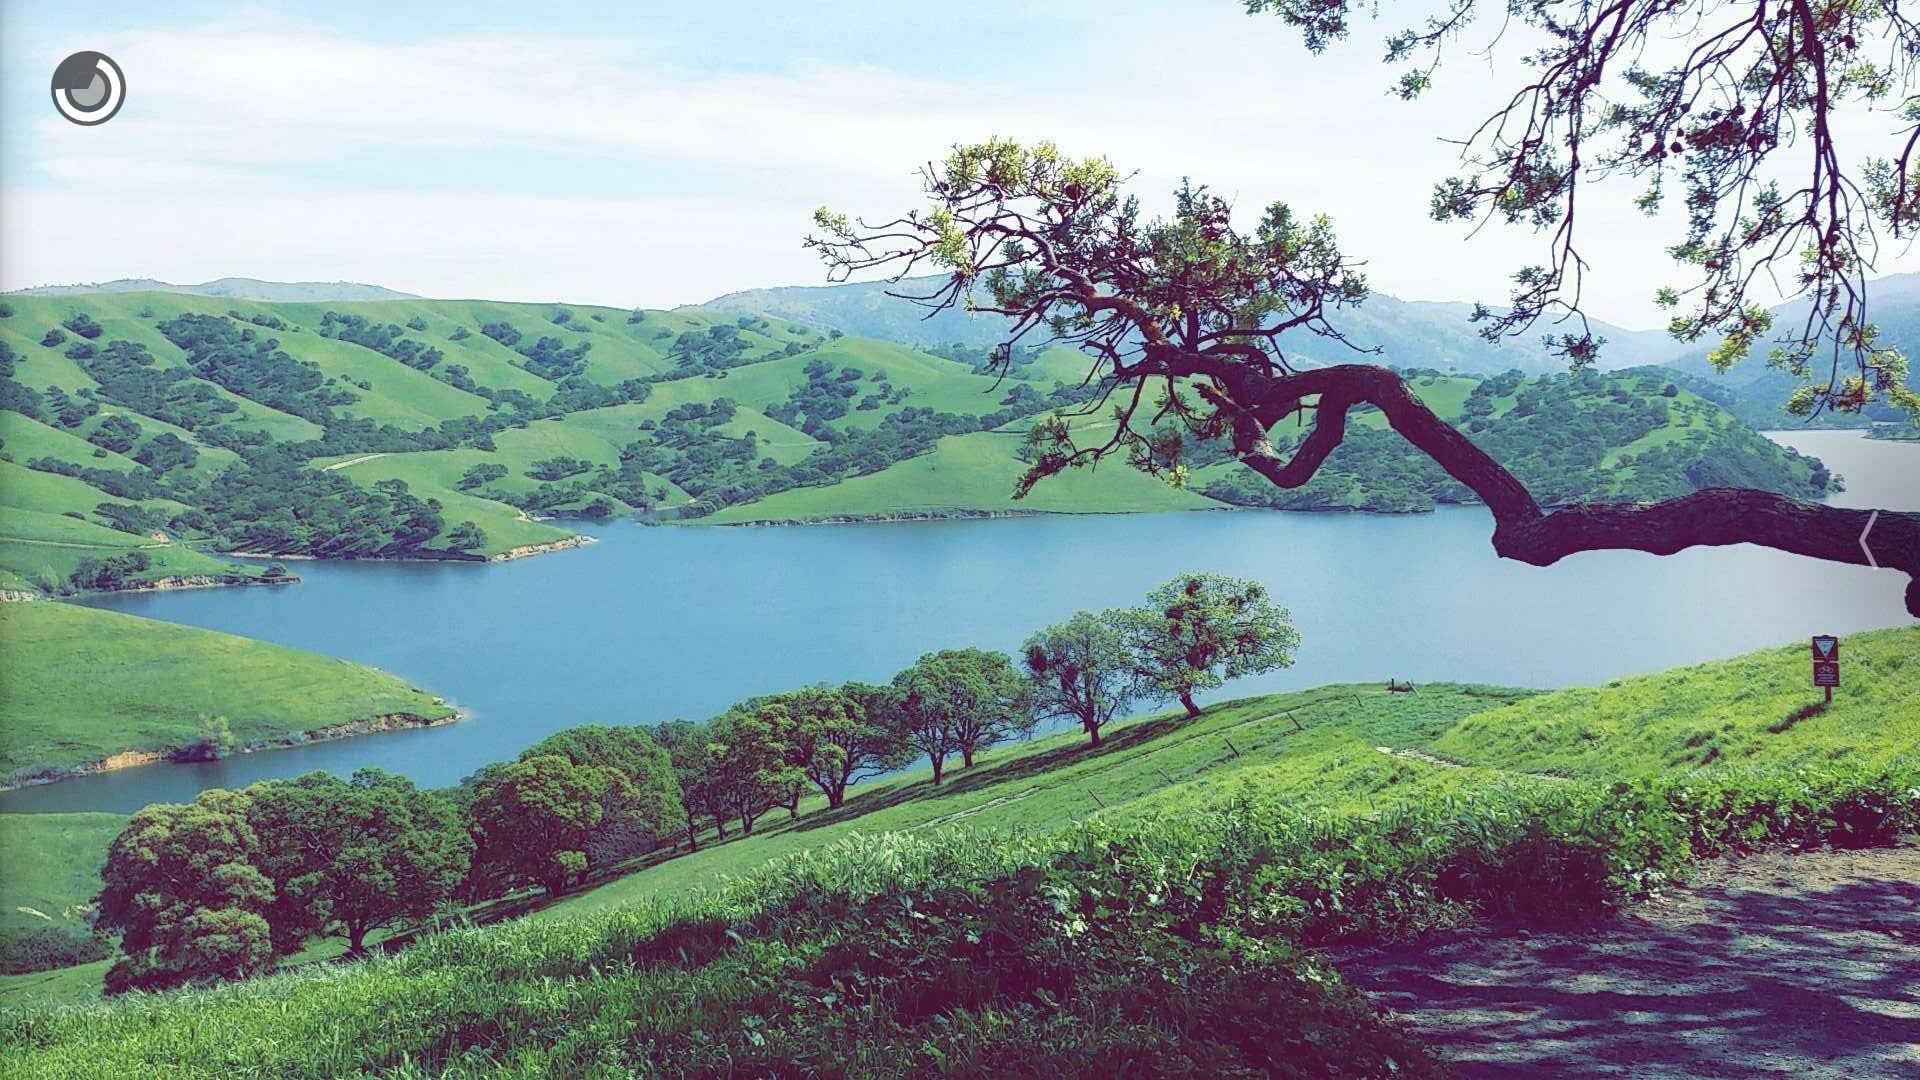 Del Valle Regional Park - Visit Tri-Valley